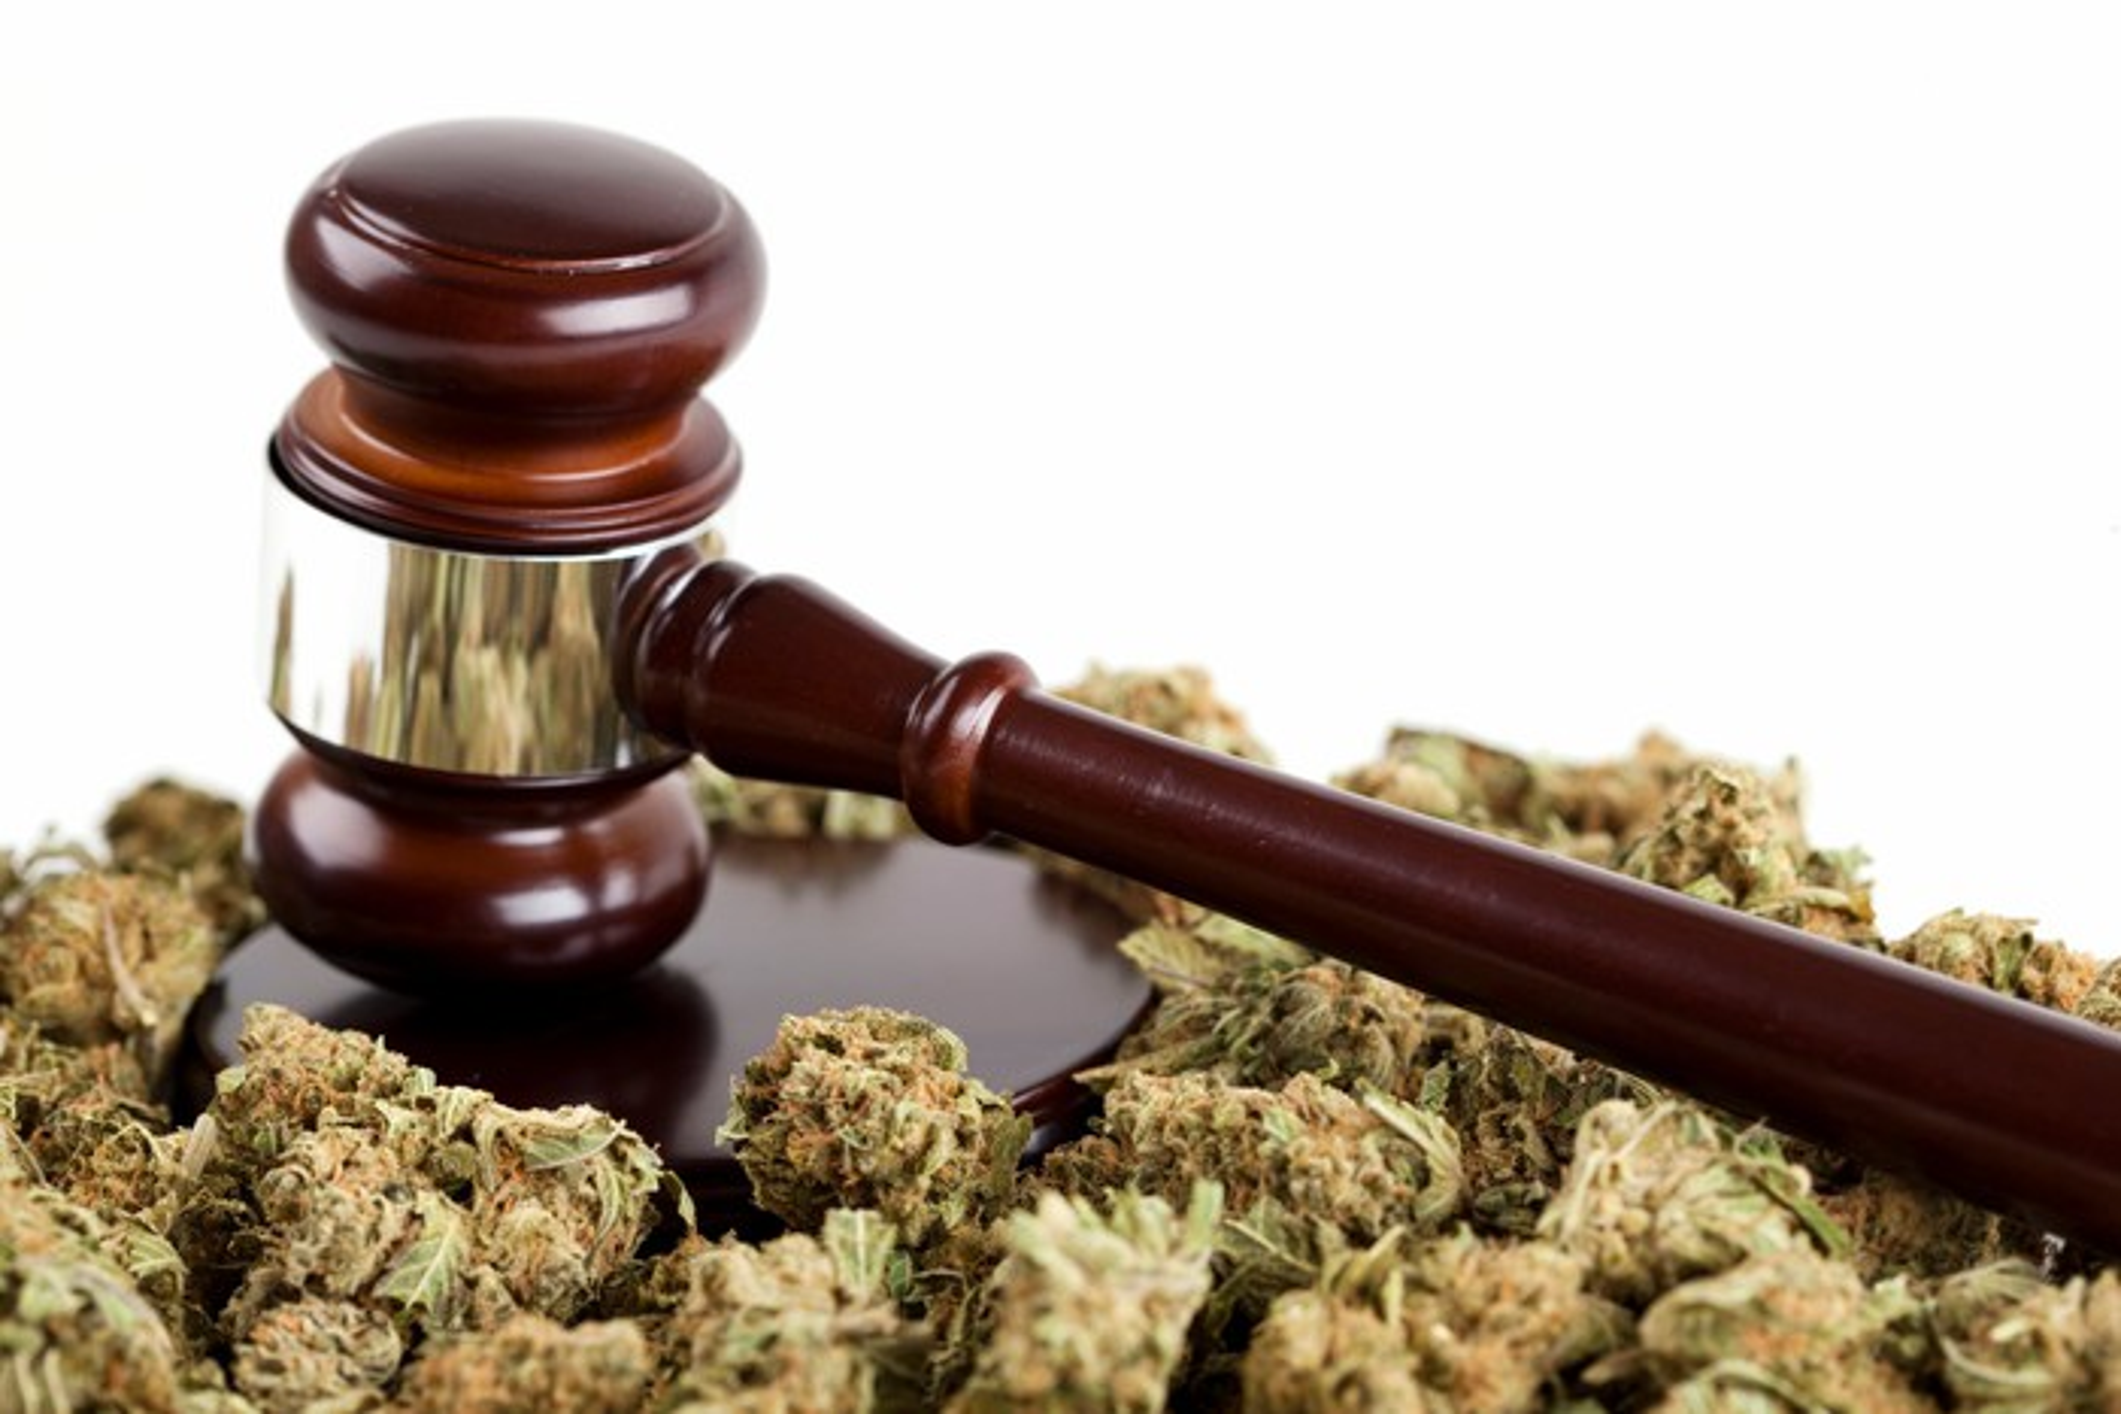 Marijuana and a judge's gavel